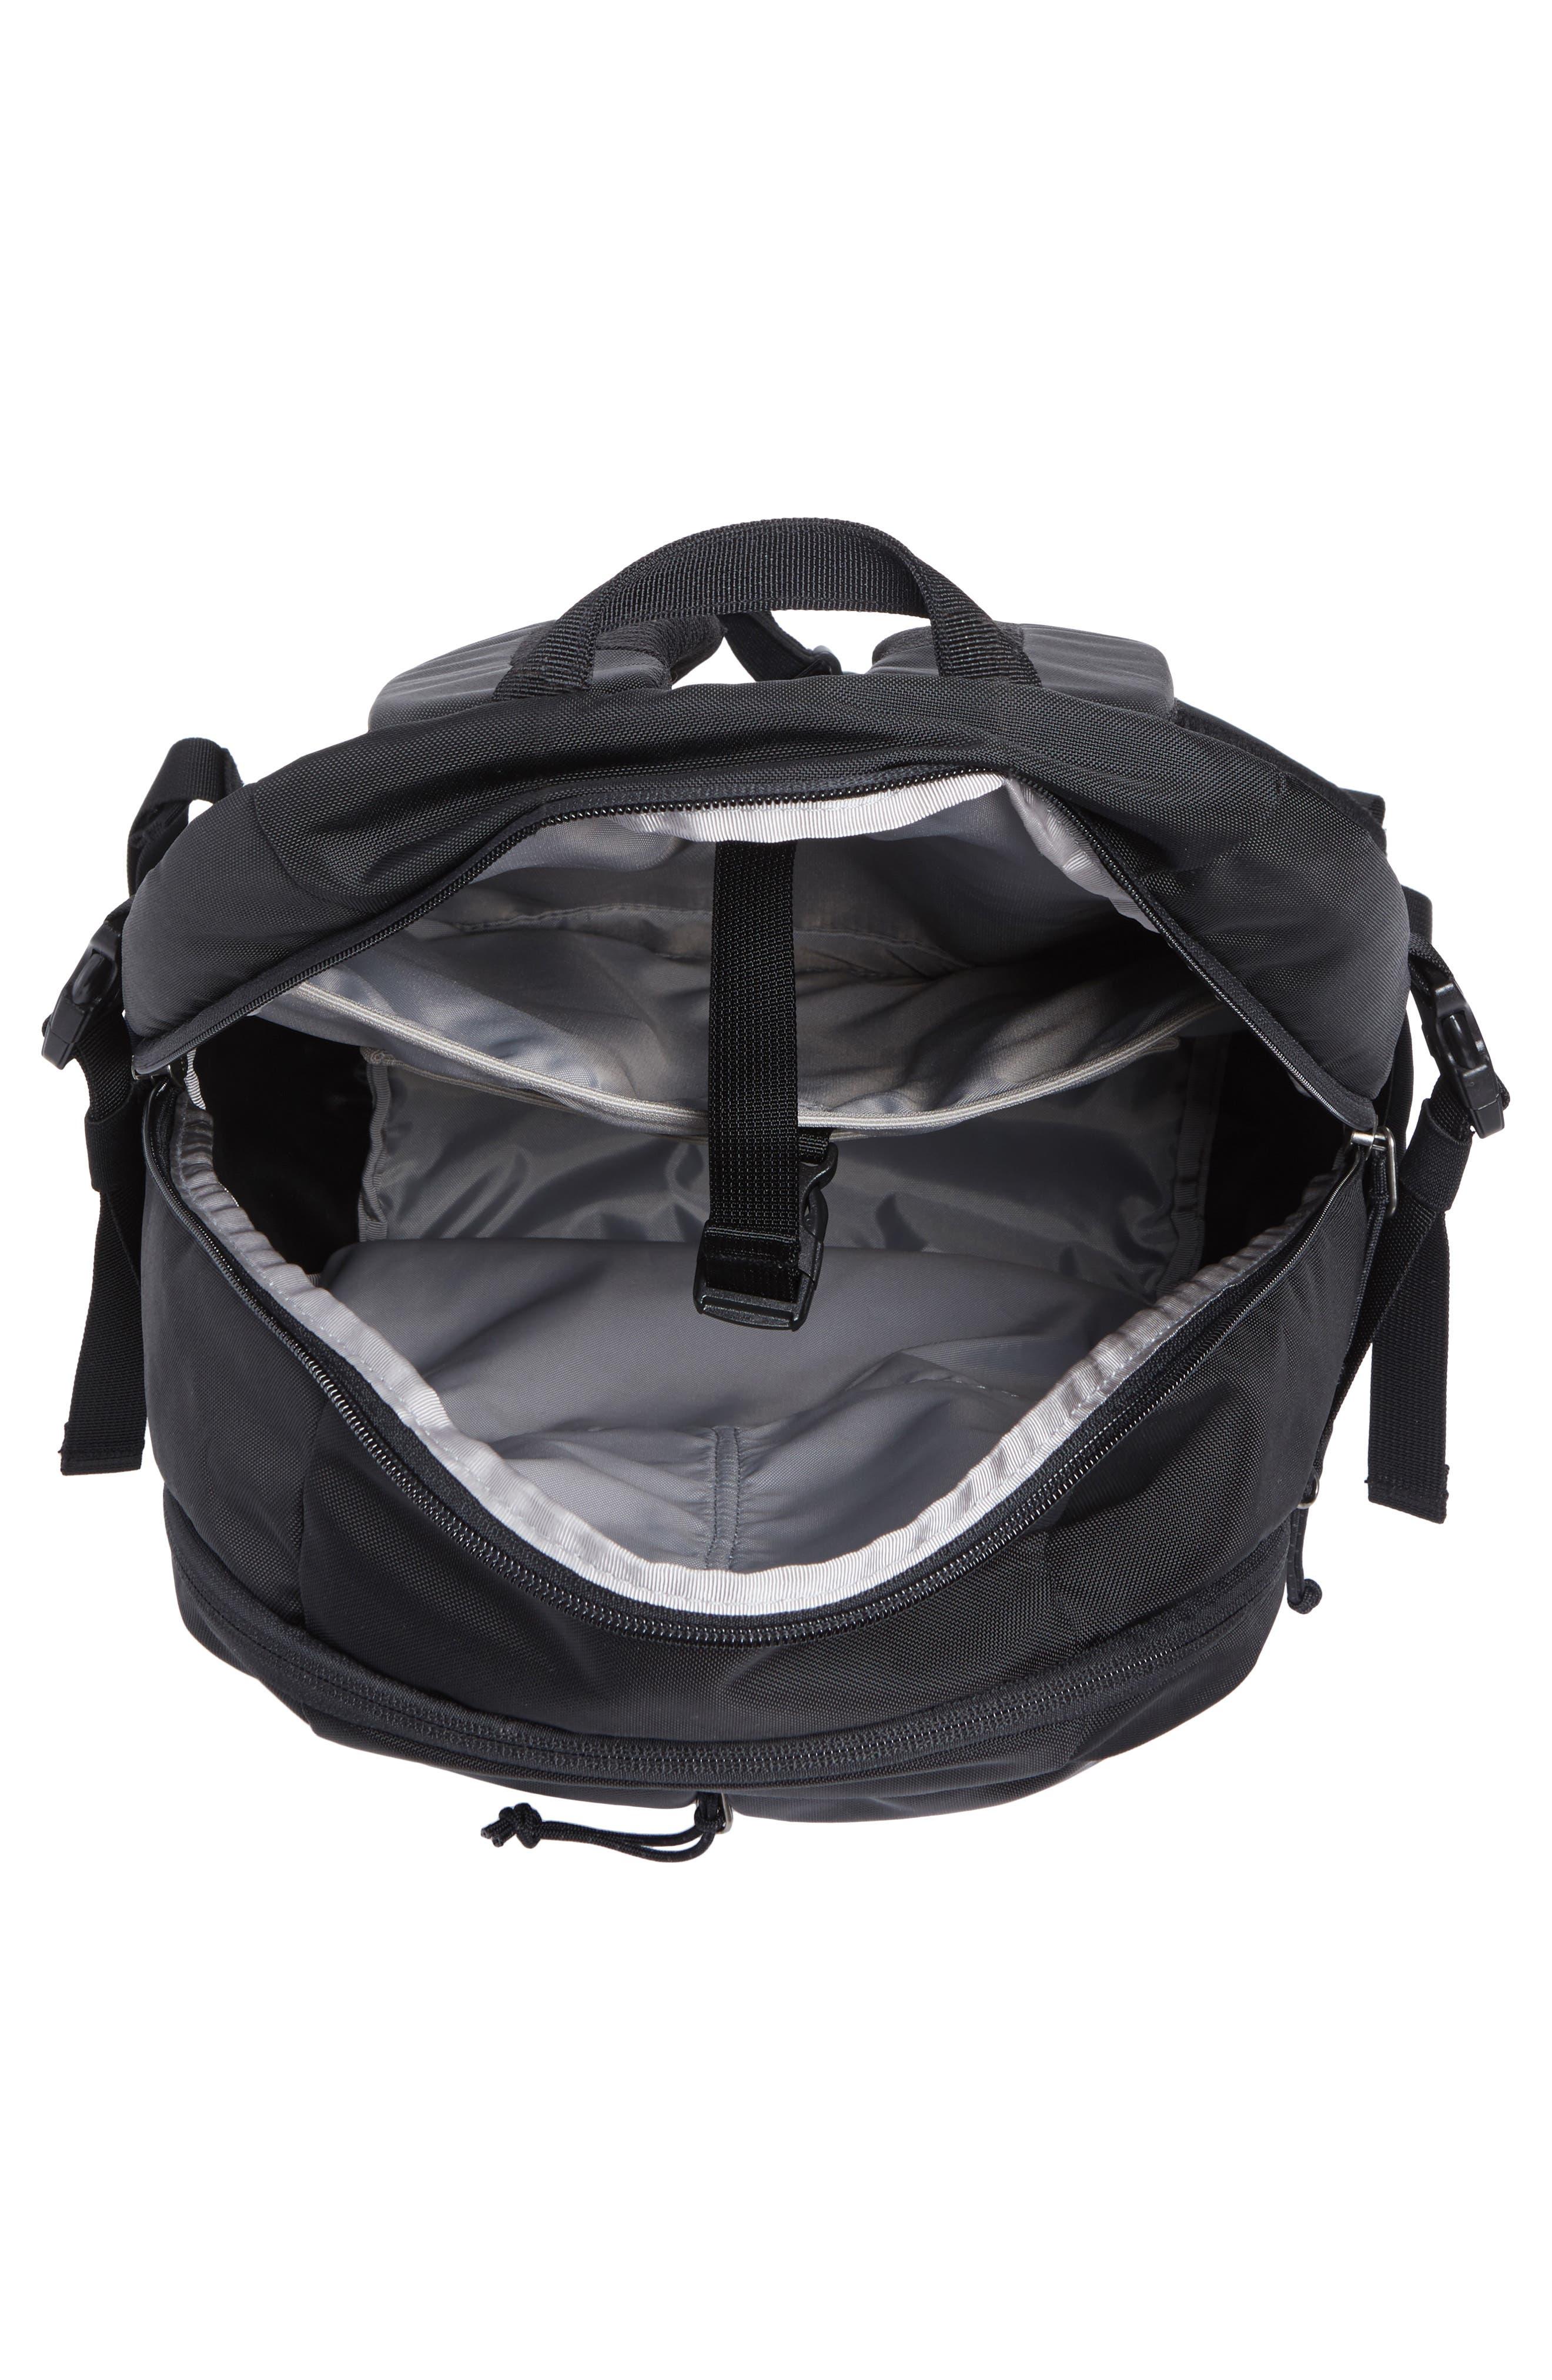 PATAGONIA, Refugio 26L Backpack, Alternate thumbnail 5, color, BLACK